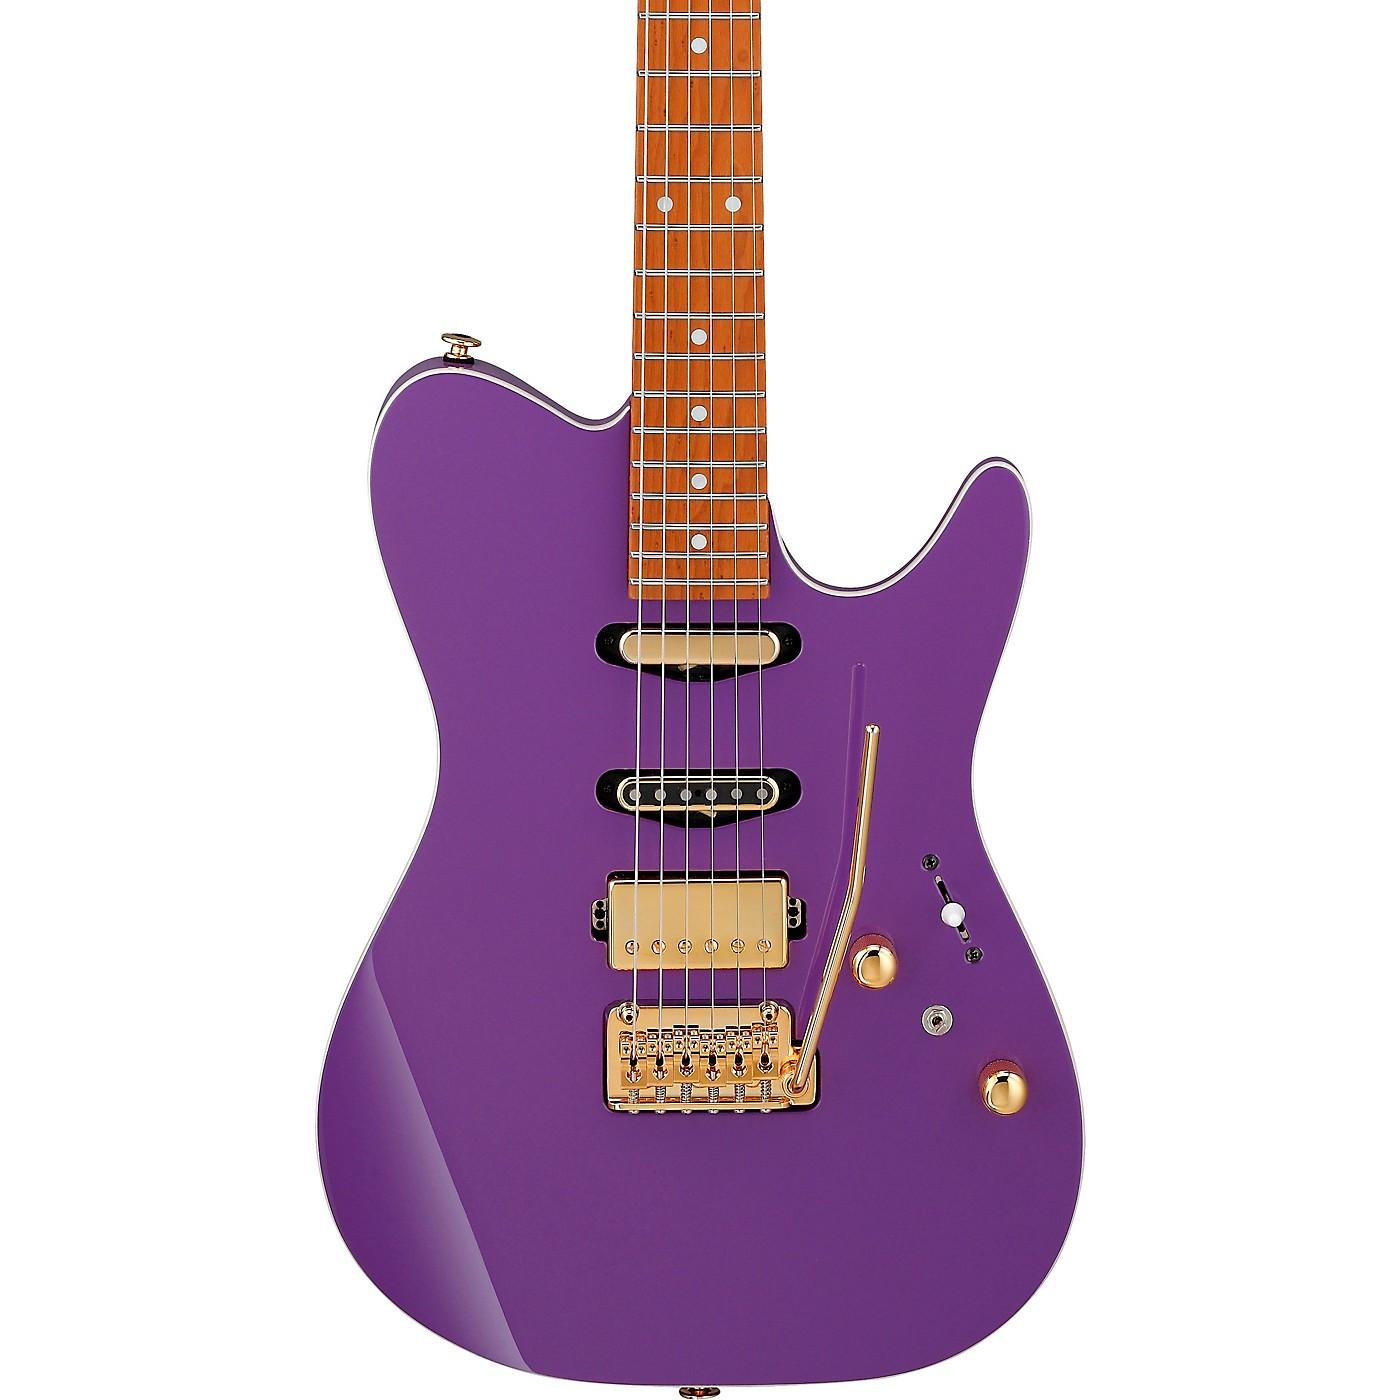 Ibanez LB1 Lari Basilio Signature Electric Guitar thumbnail